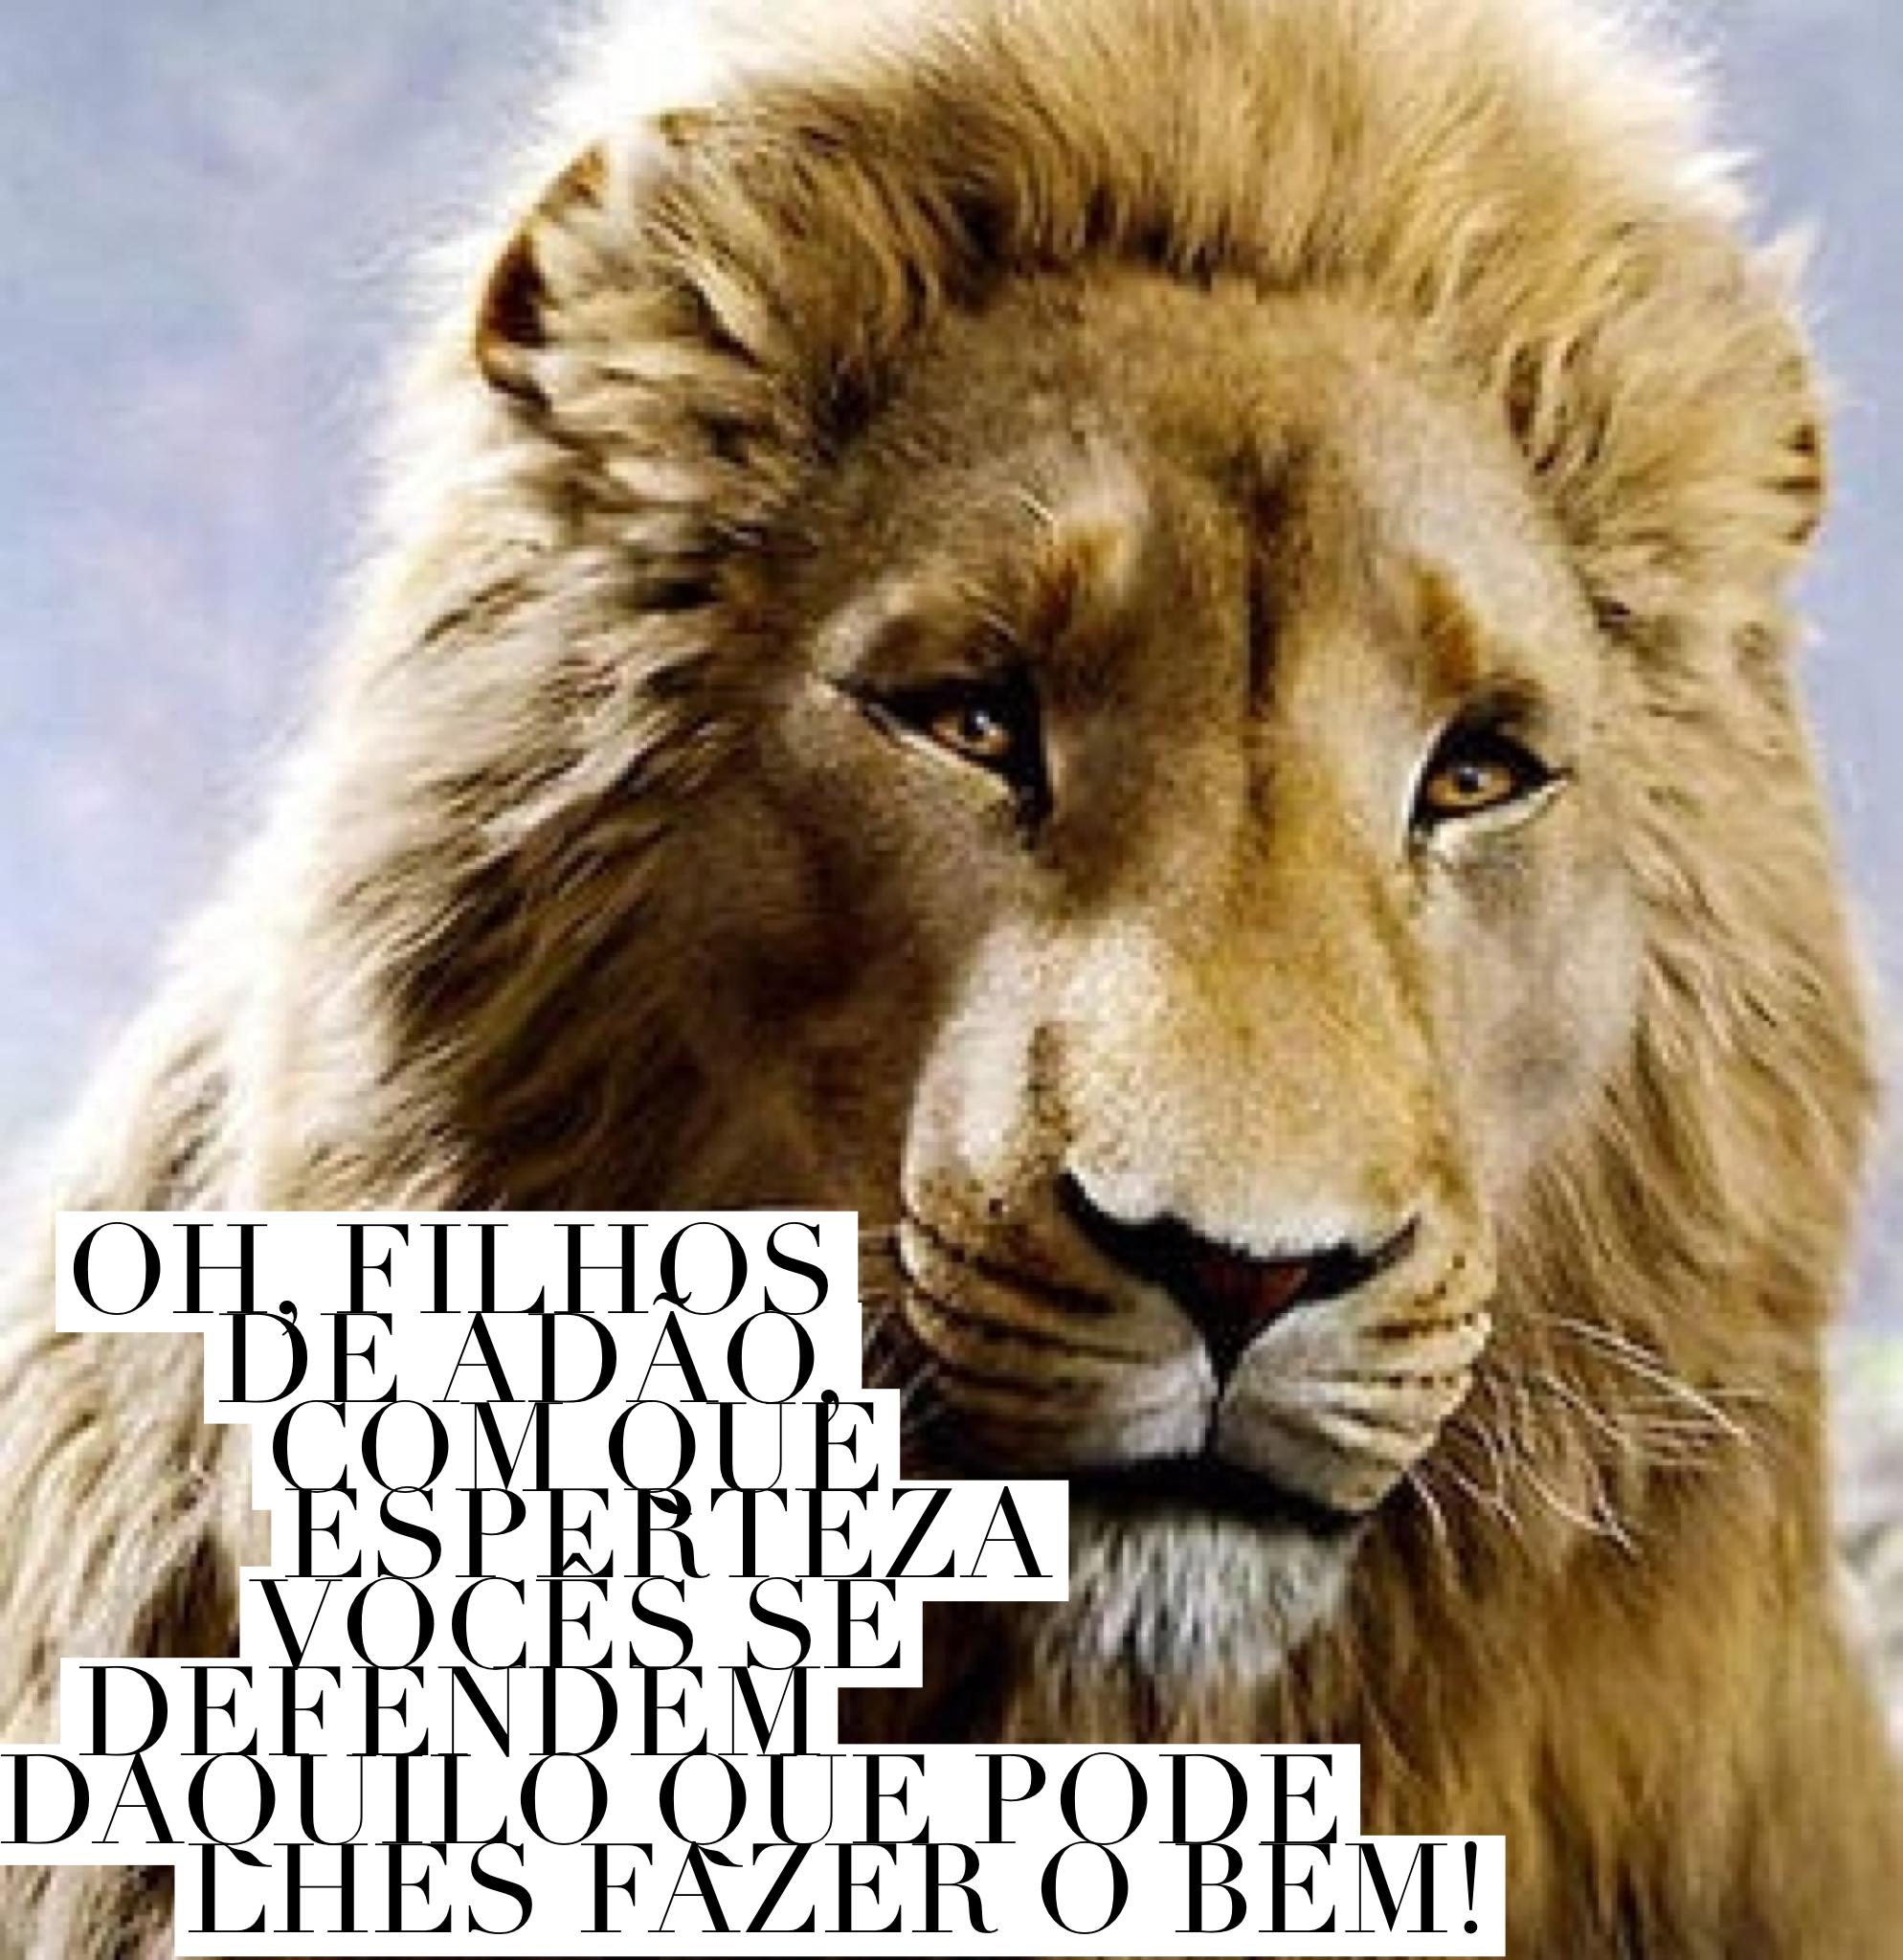 Nárnia; frases | Narnia | Pinterest | Autoestima y Frases